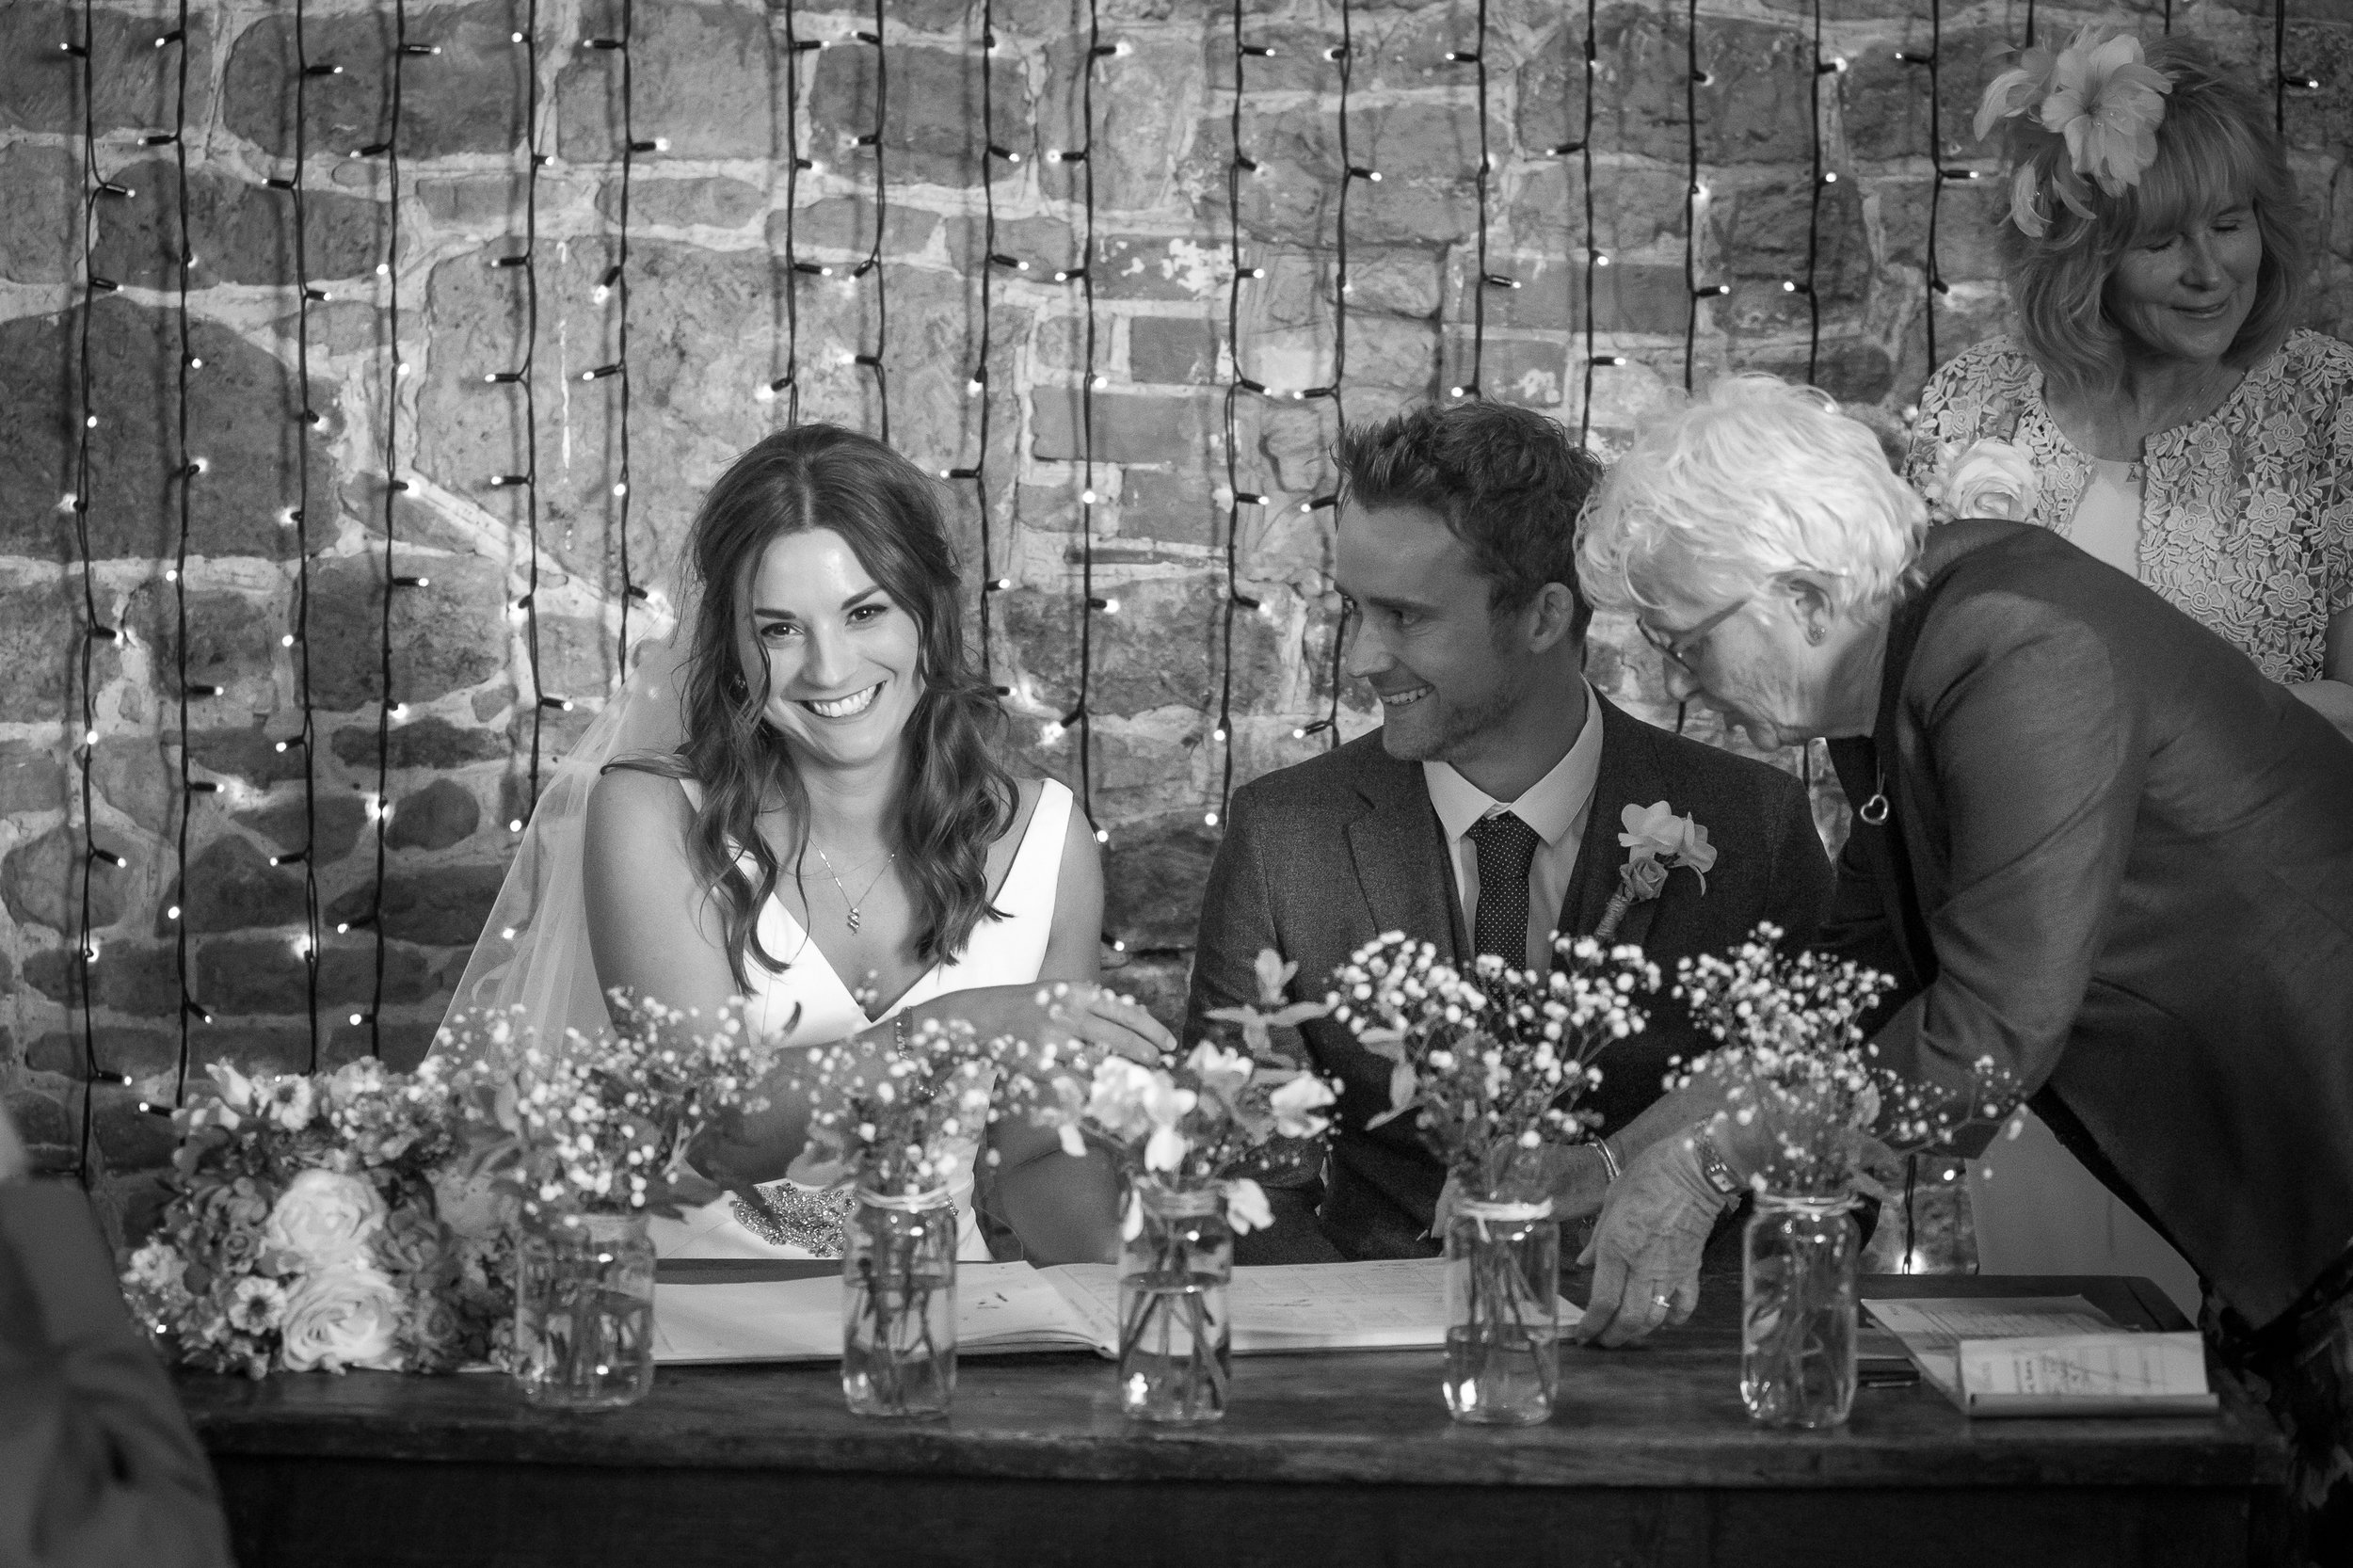 Grittenham Barn female wedding photographers west sussex petworth social-66.jpg